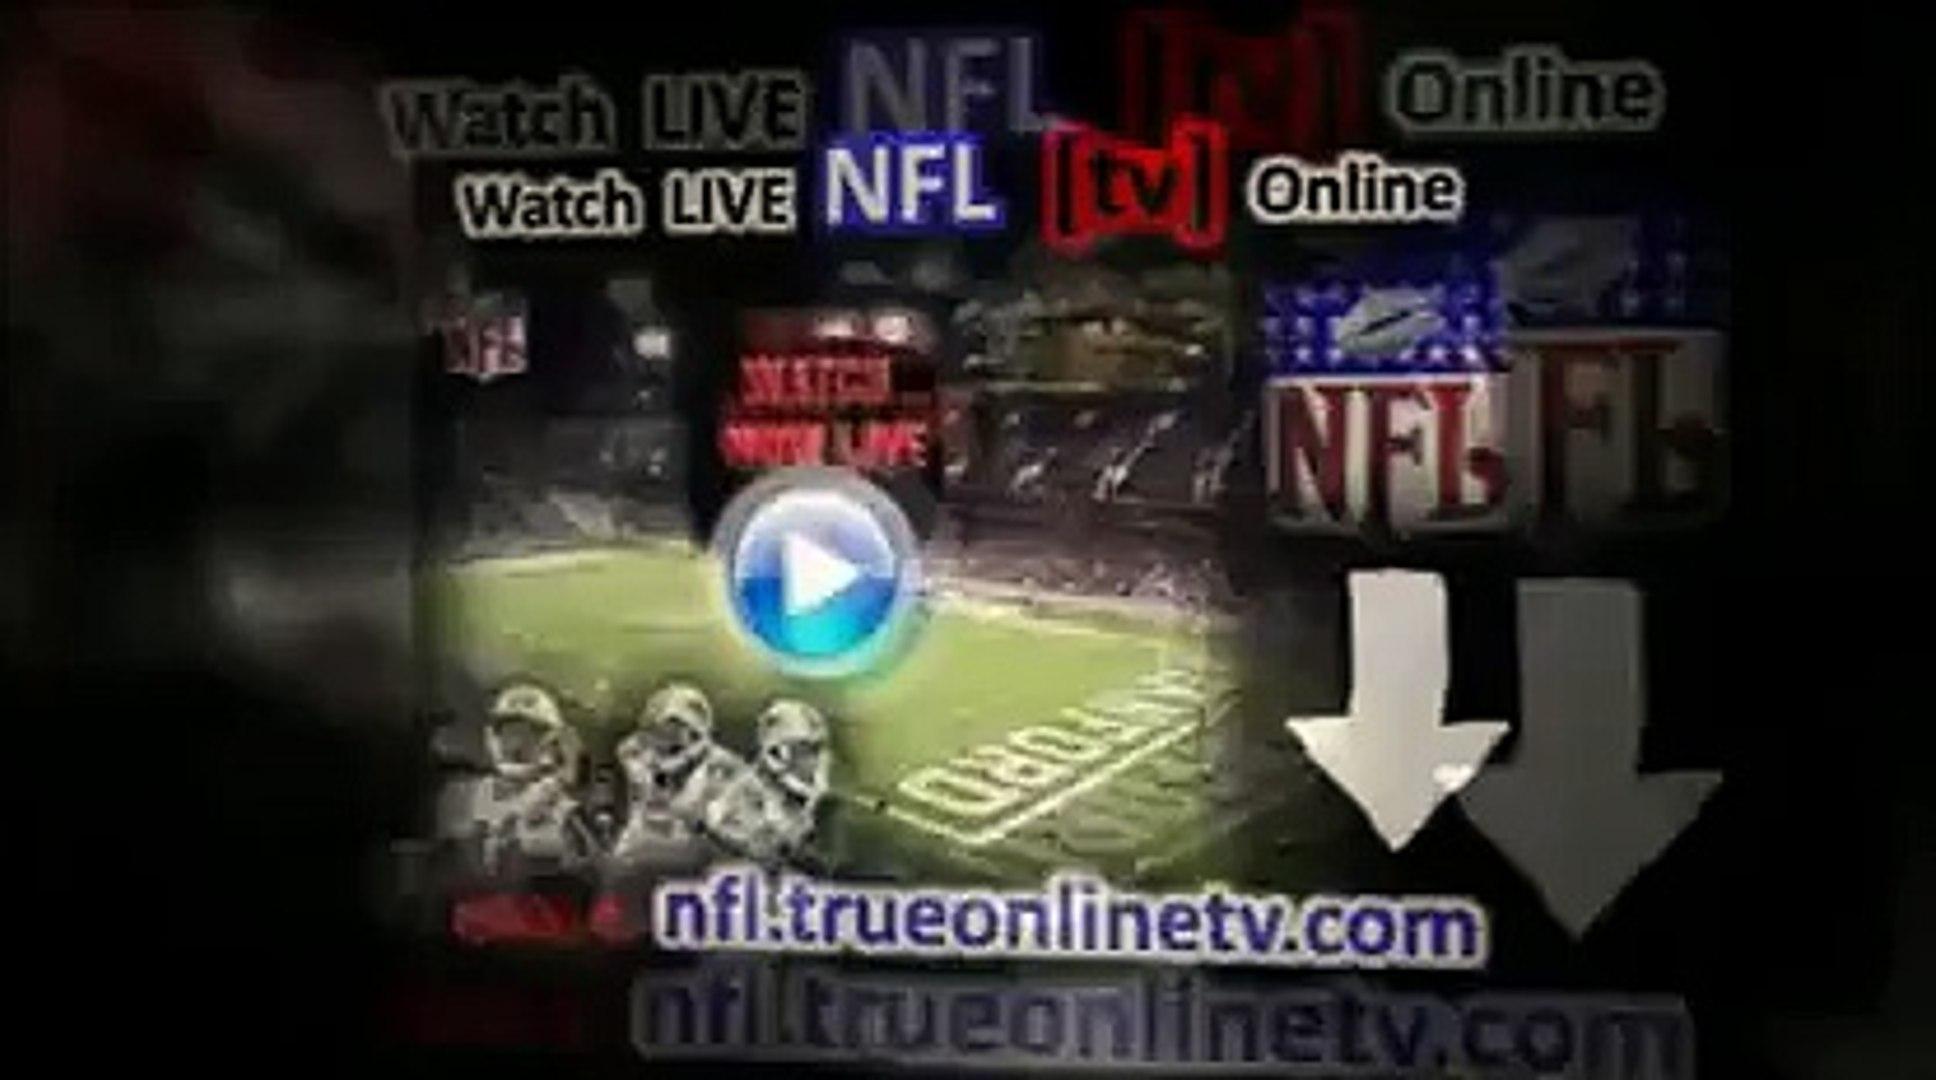 Watch buffalo bills vs indianapolis colts streaming sunday night football week 1 games live